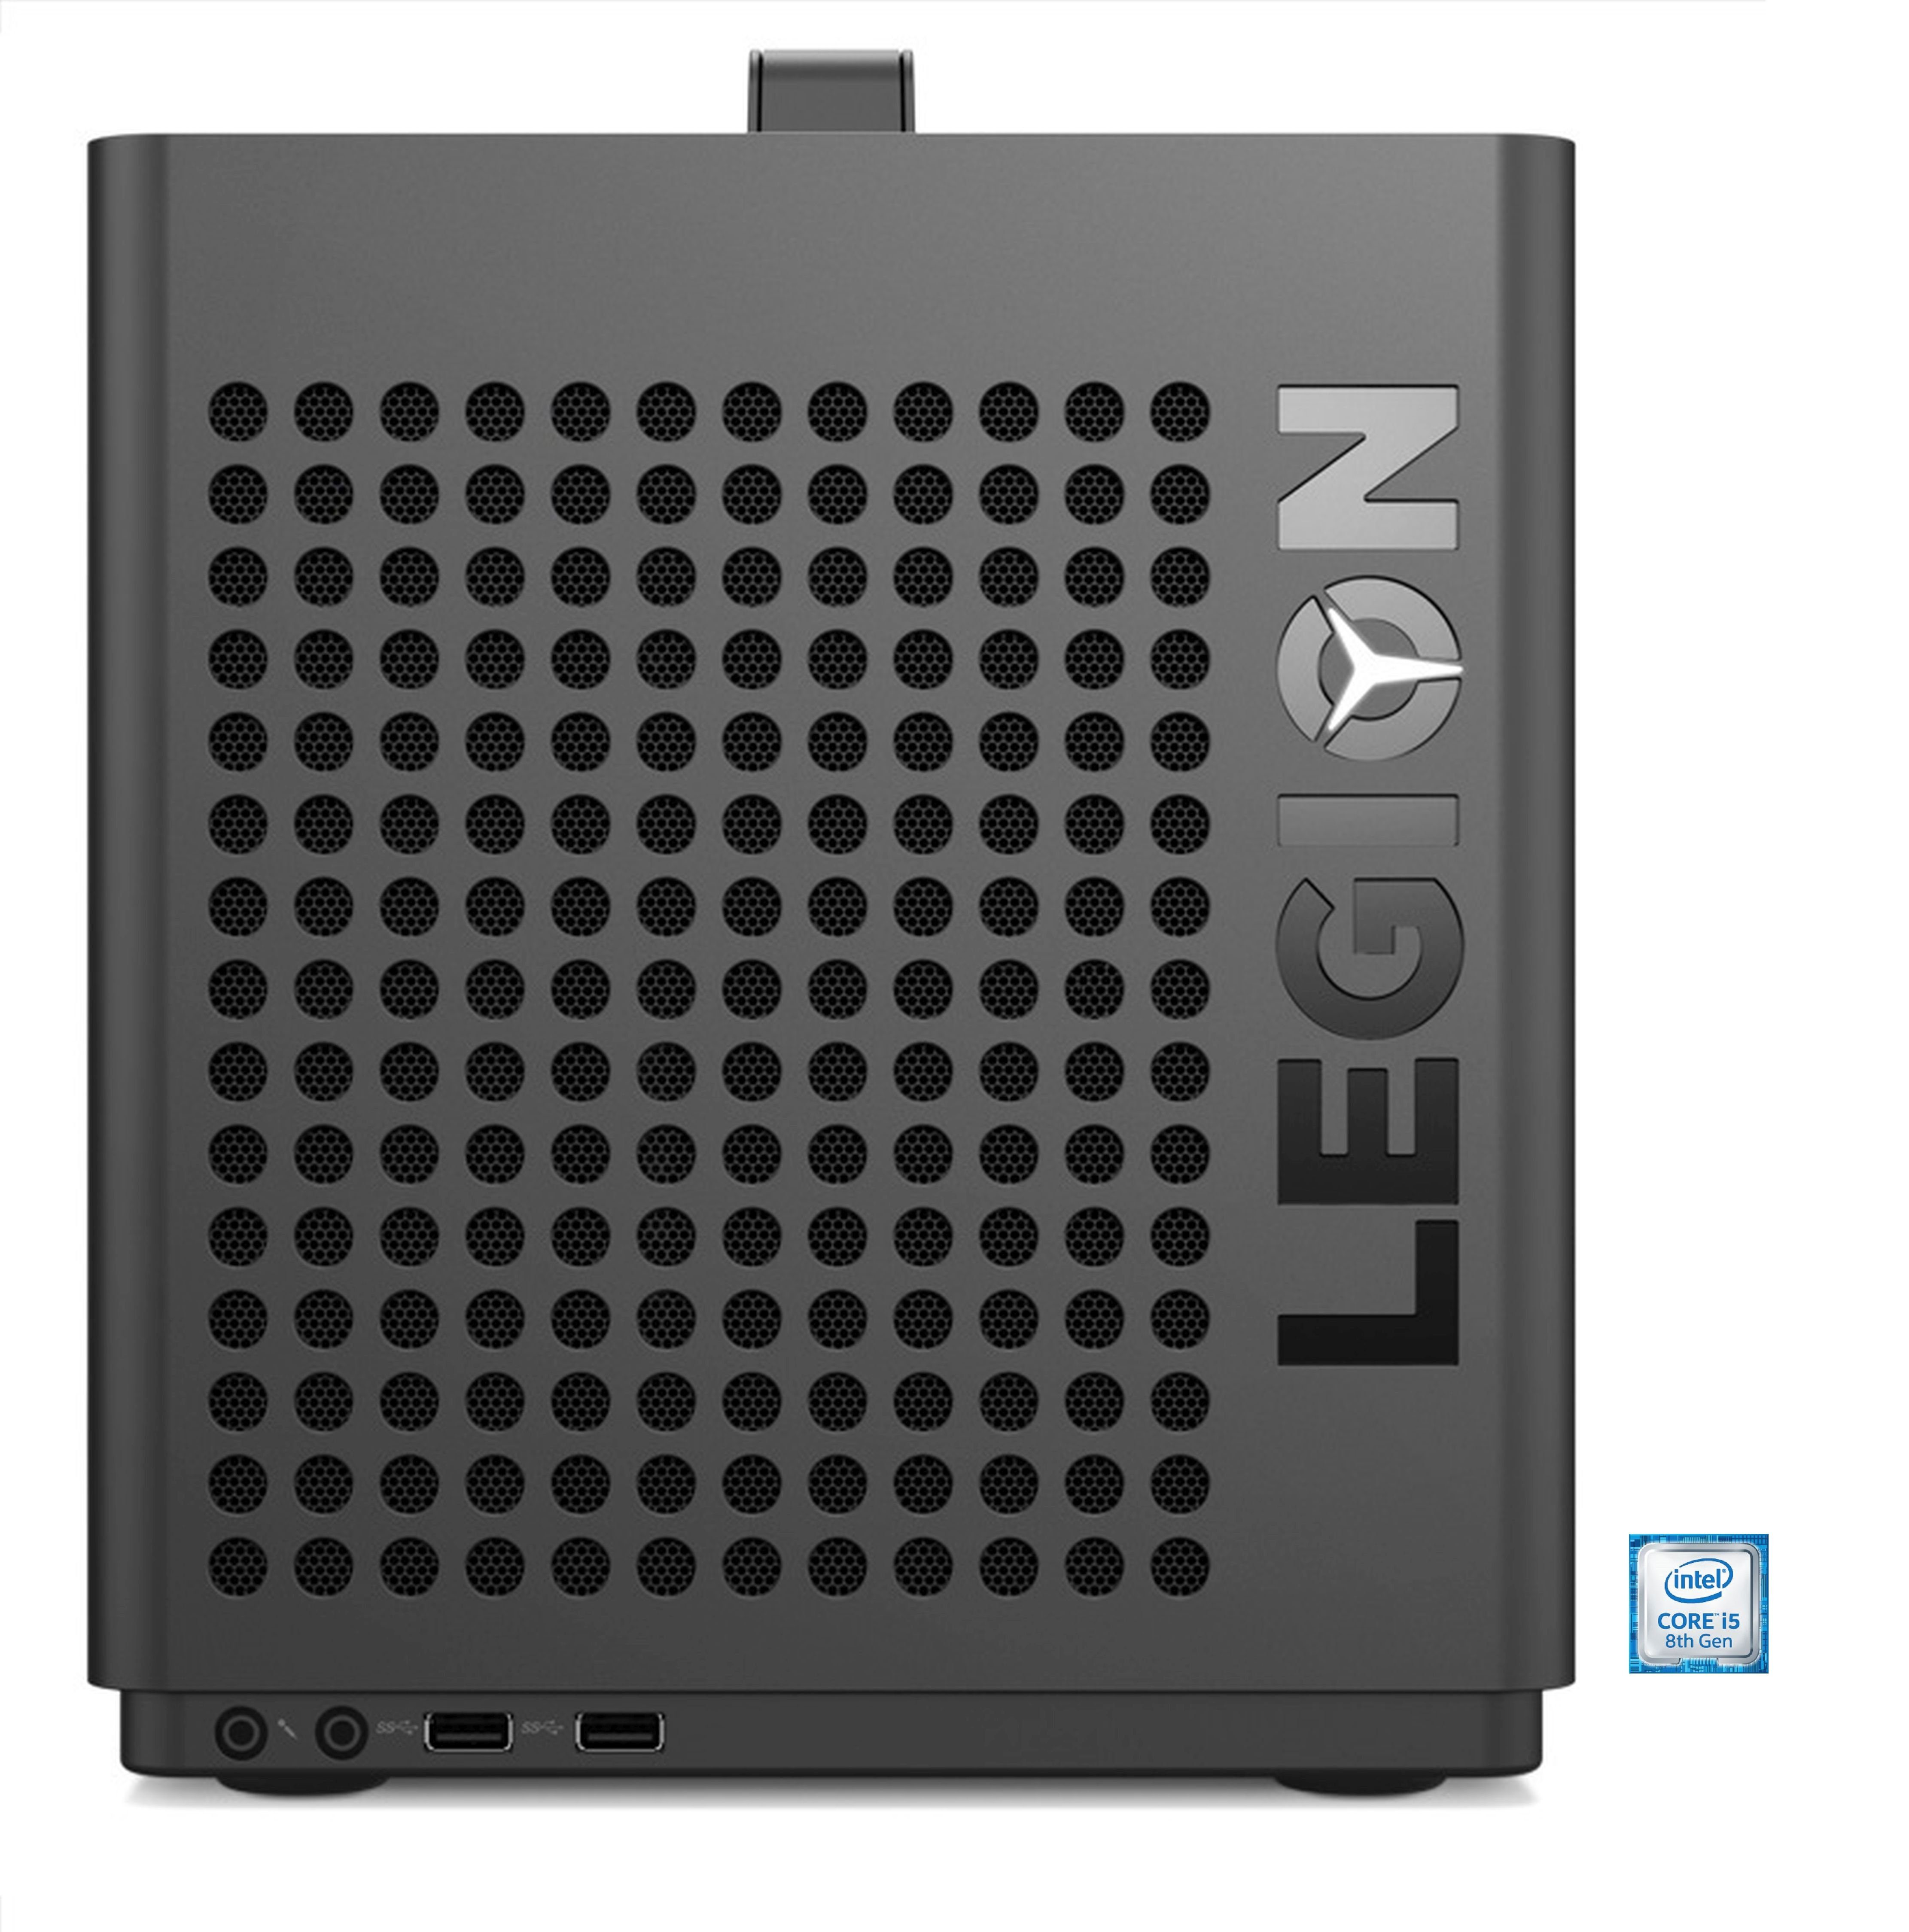 LENOVO Legion C530-19ICB »Intel Core i5, GTX 1050, 2 TB HDD, 8 GB«